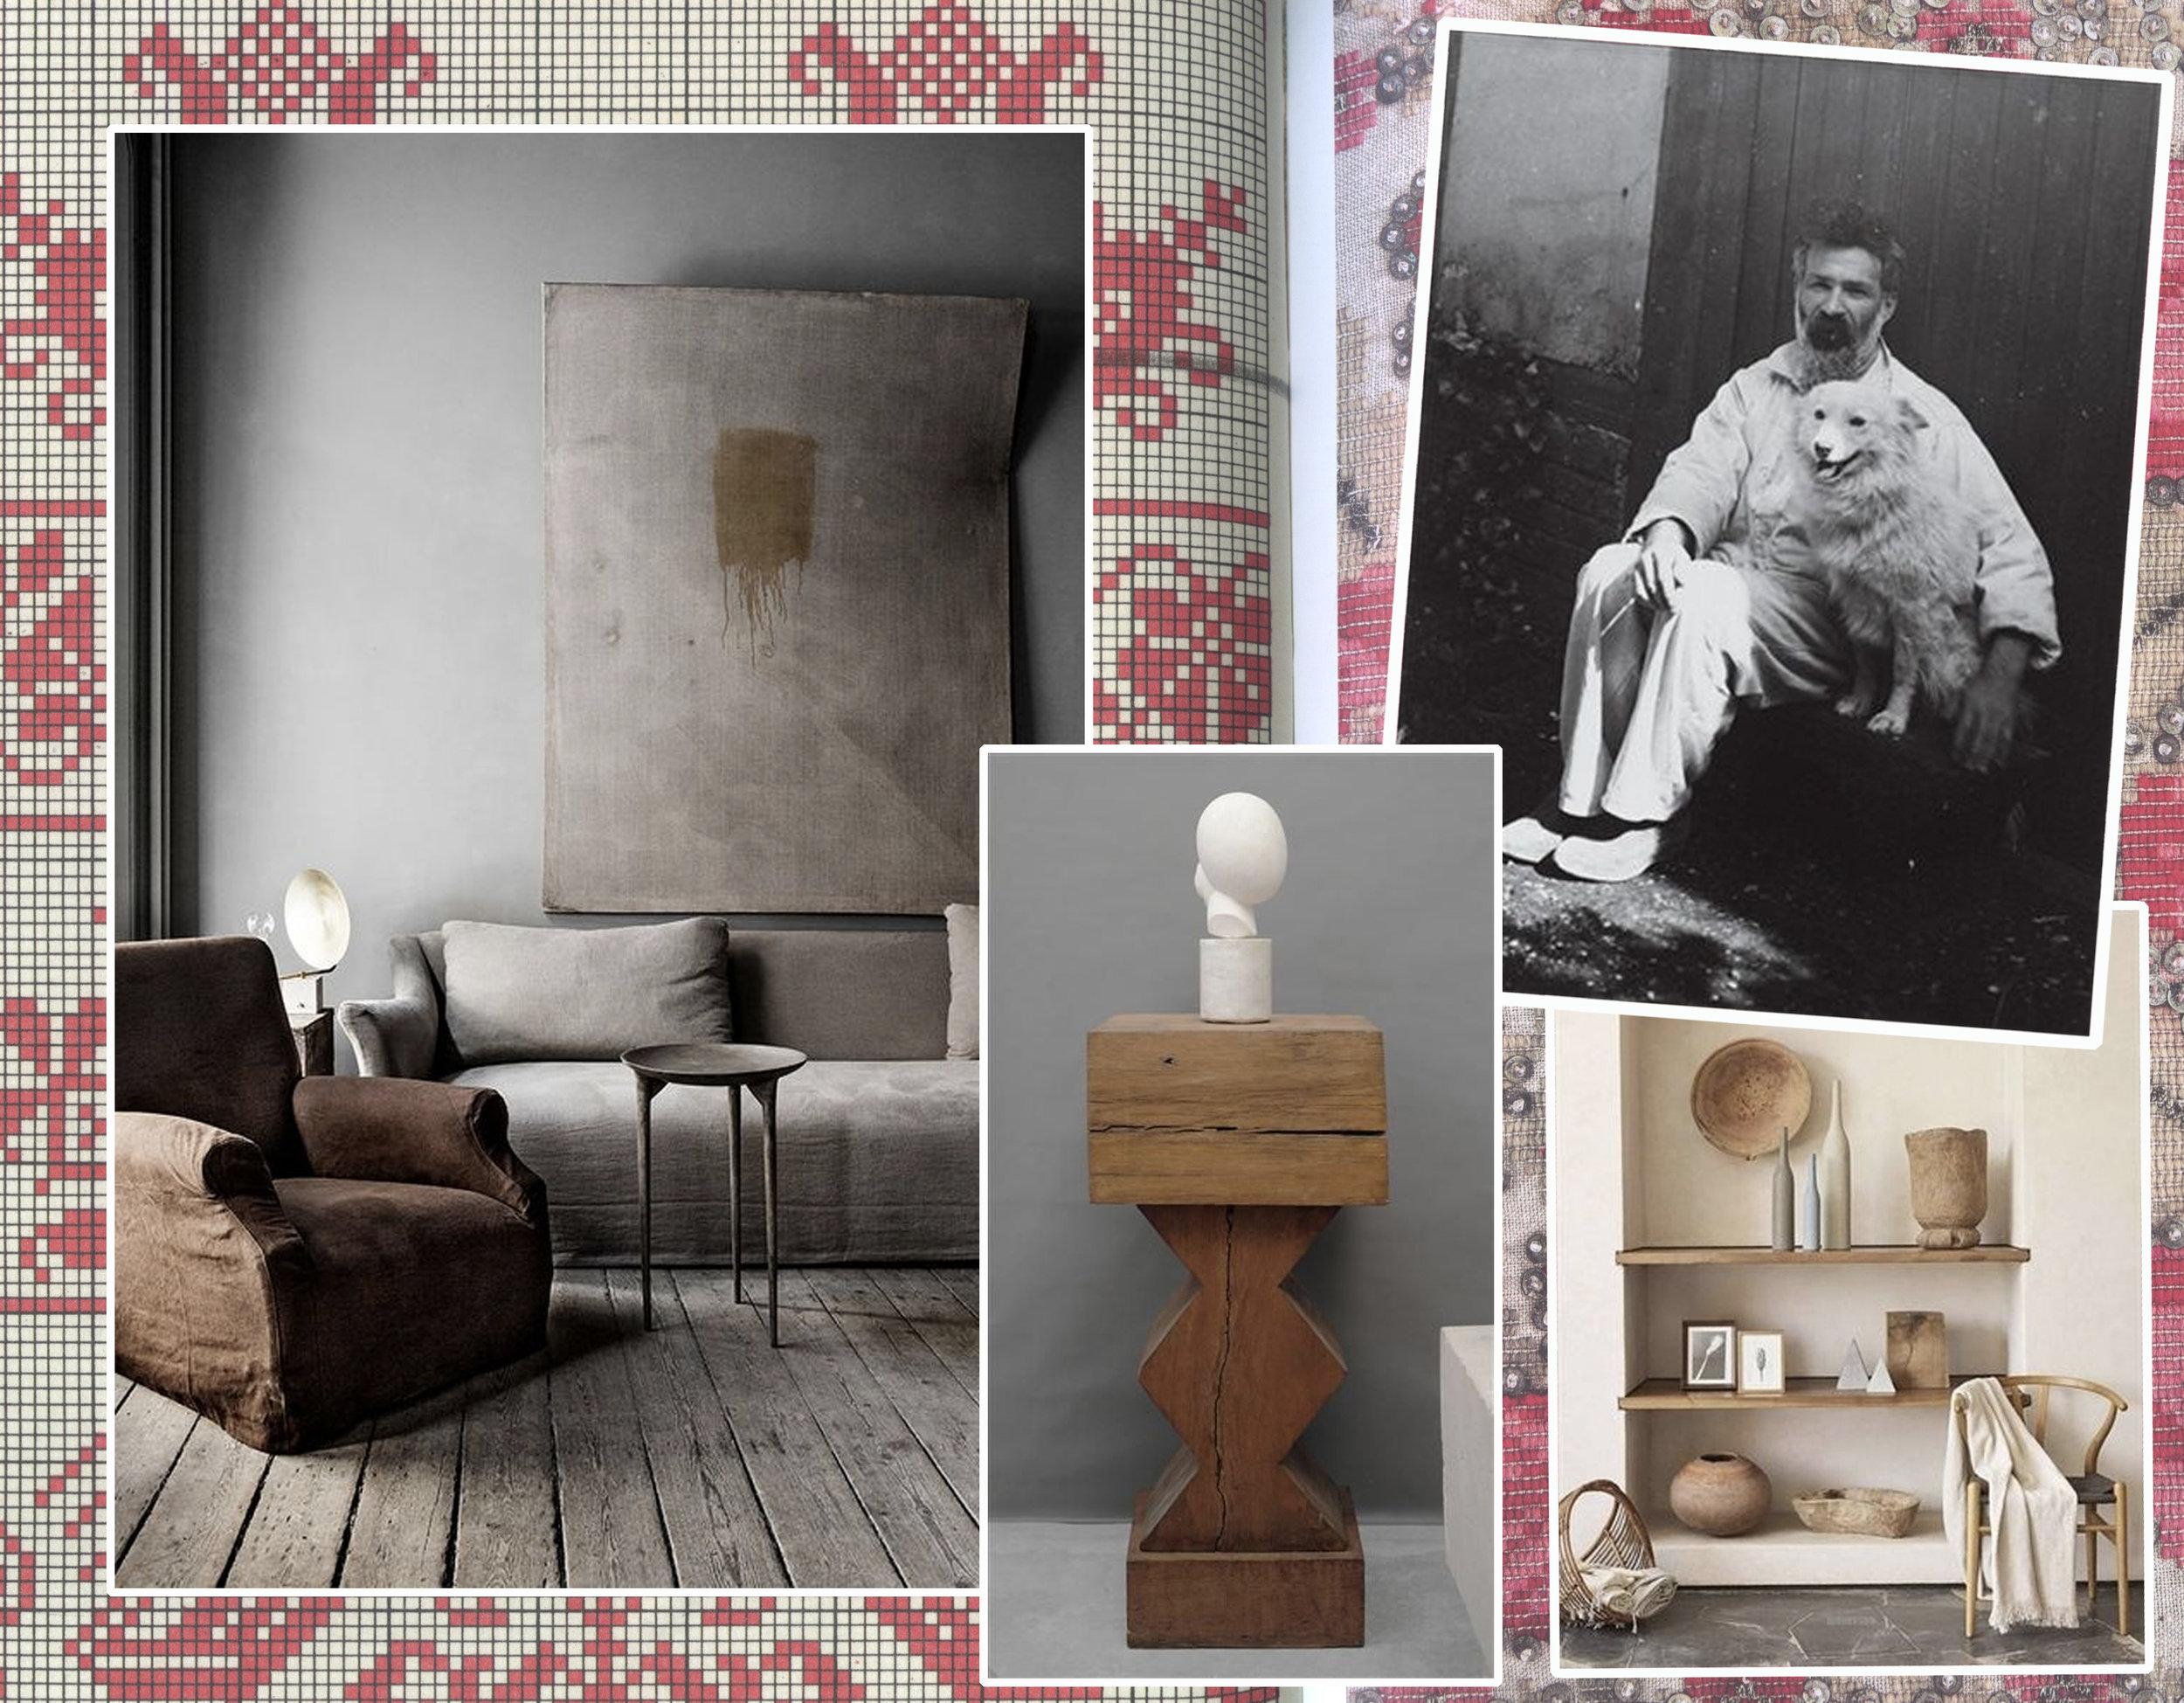 image from  Peasants Museum  Bucarest - living room image via  Apartment Therapy -  Decoration on shelves via  Journelles  -  Brancusi